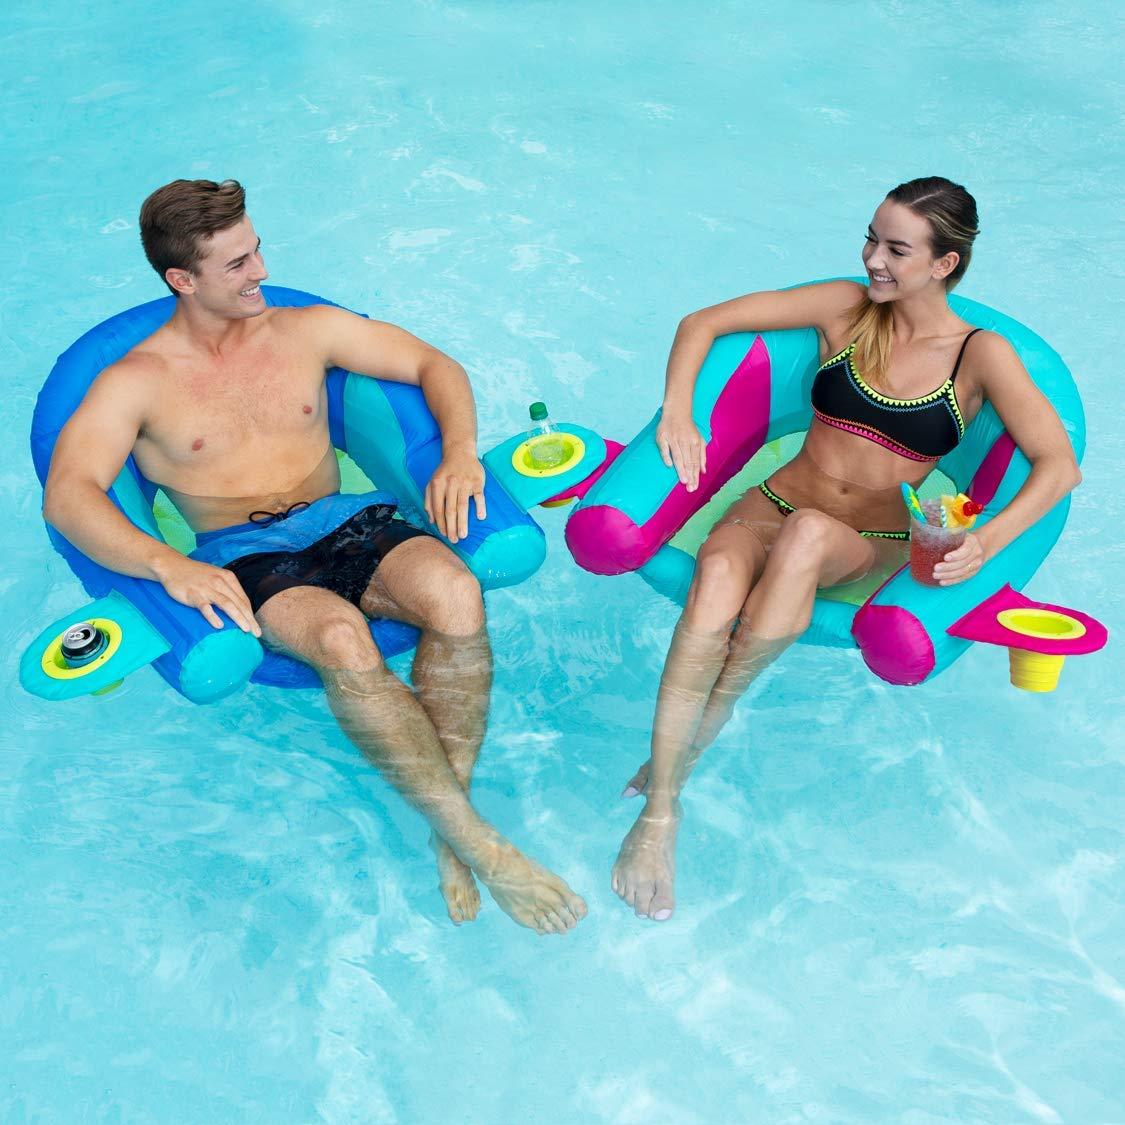 Interlocking Swim Loungers for Pool or Lake Blue SwimWays AquaLinx Floats